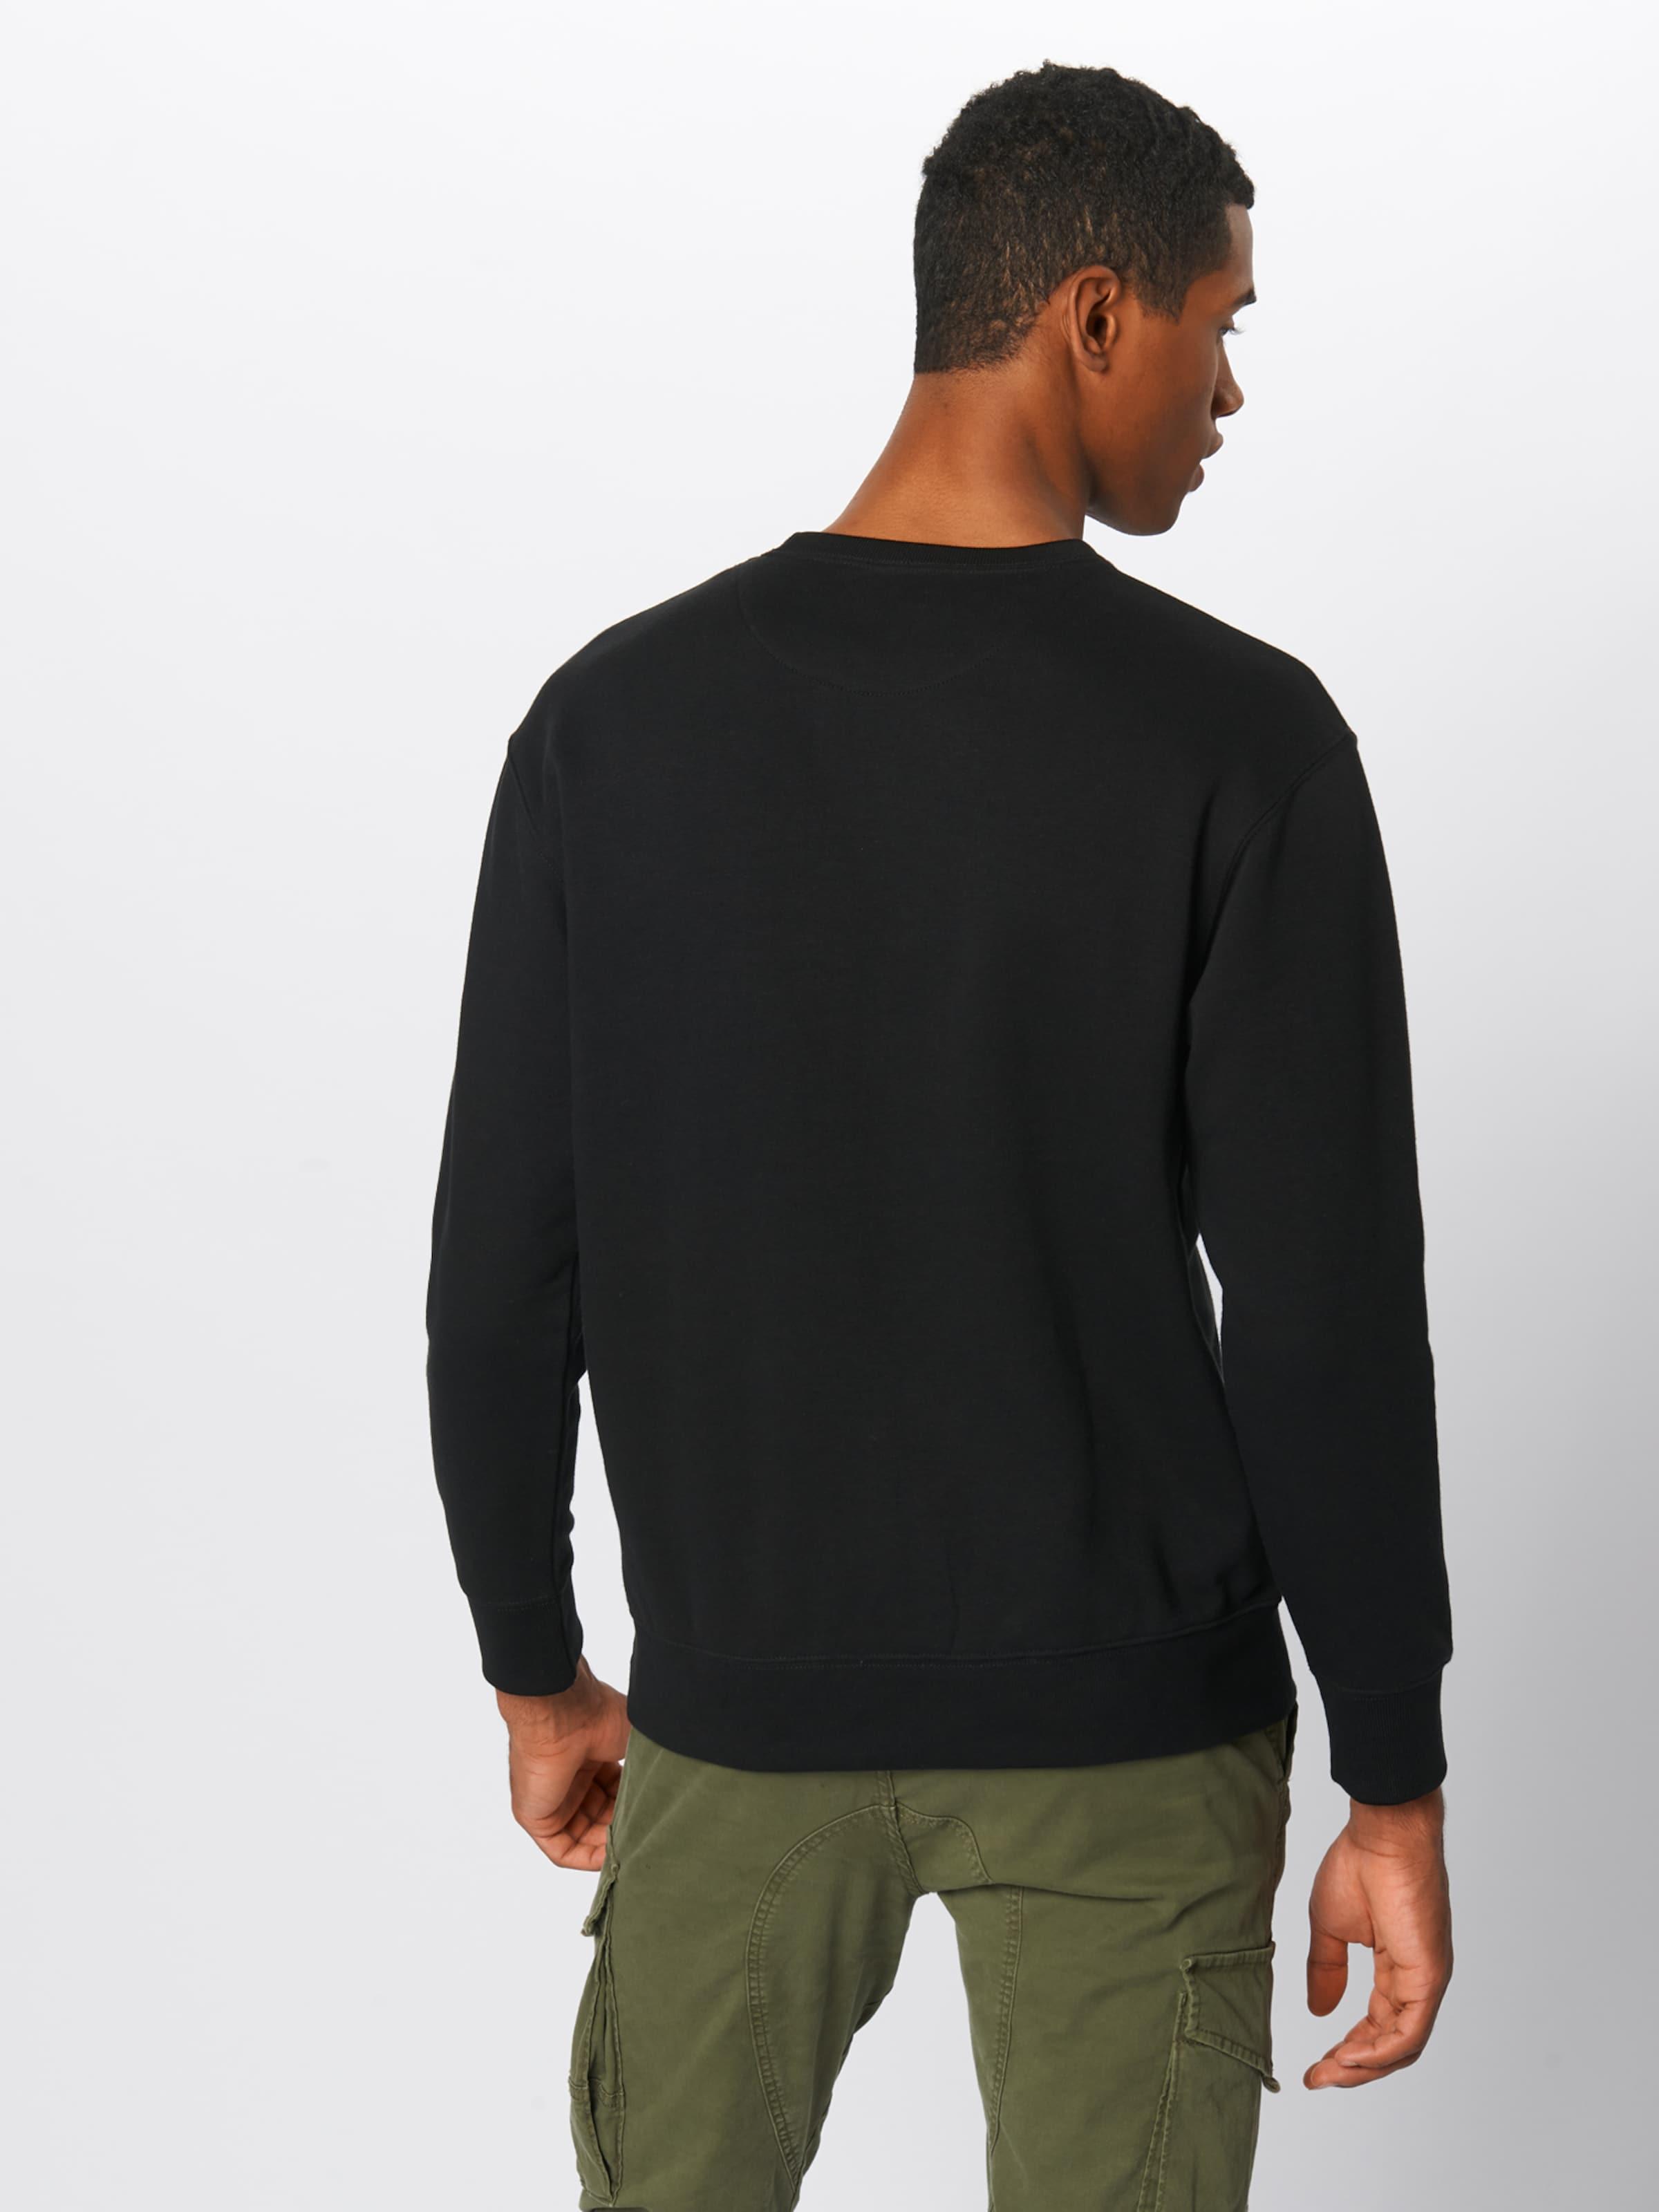 Sweat Jackamp; En 'soft' Noir shirt Jones lFJc31TK